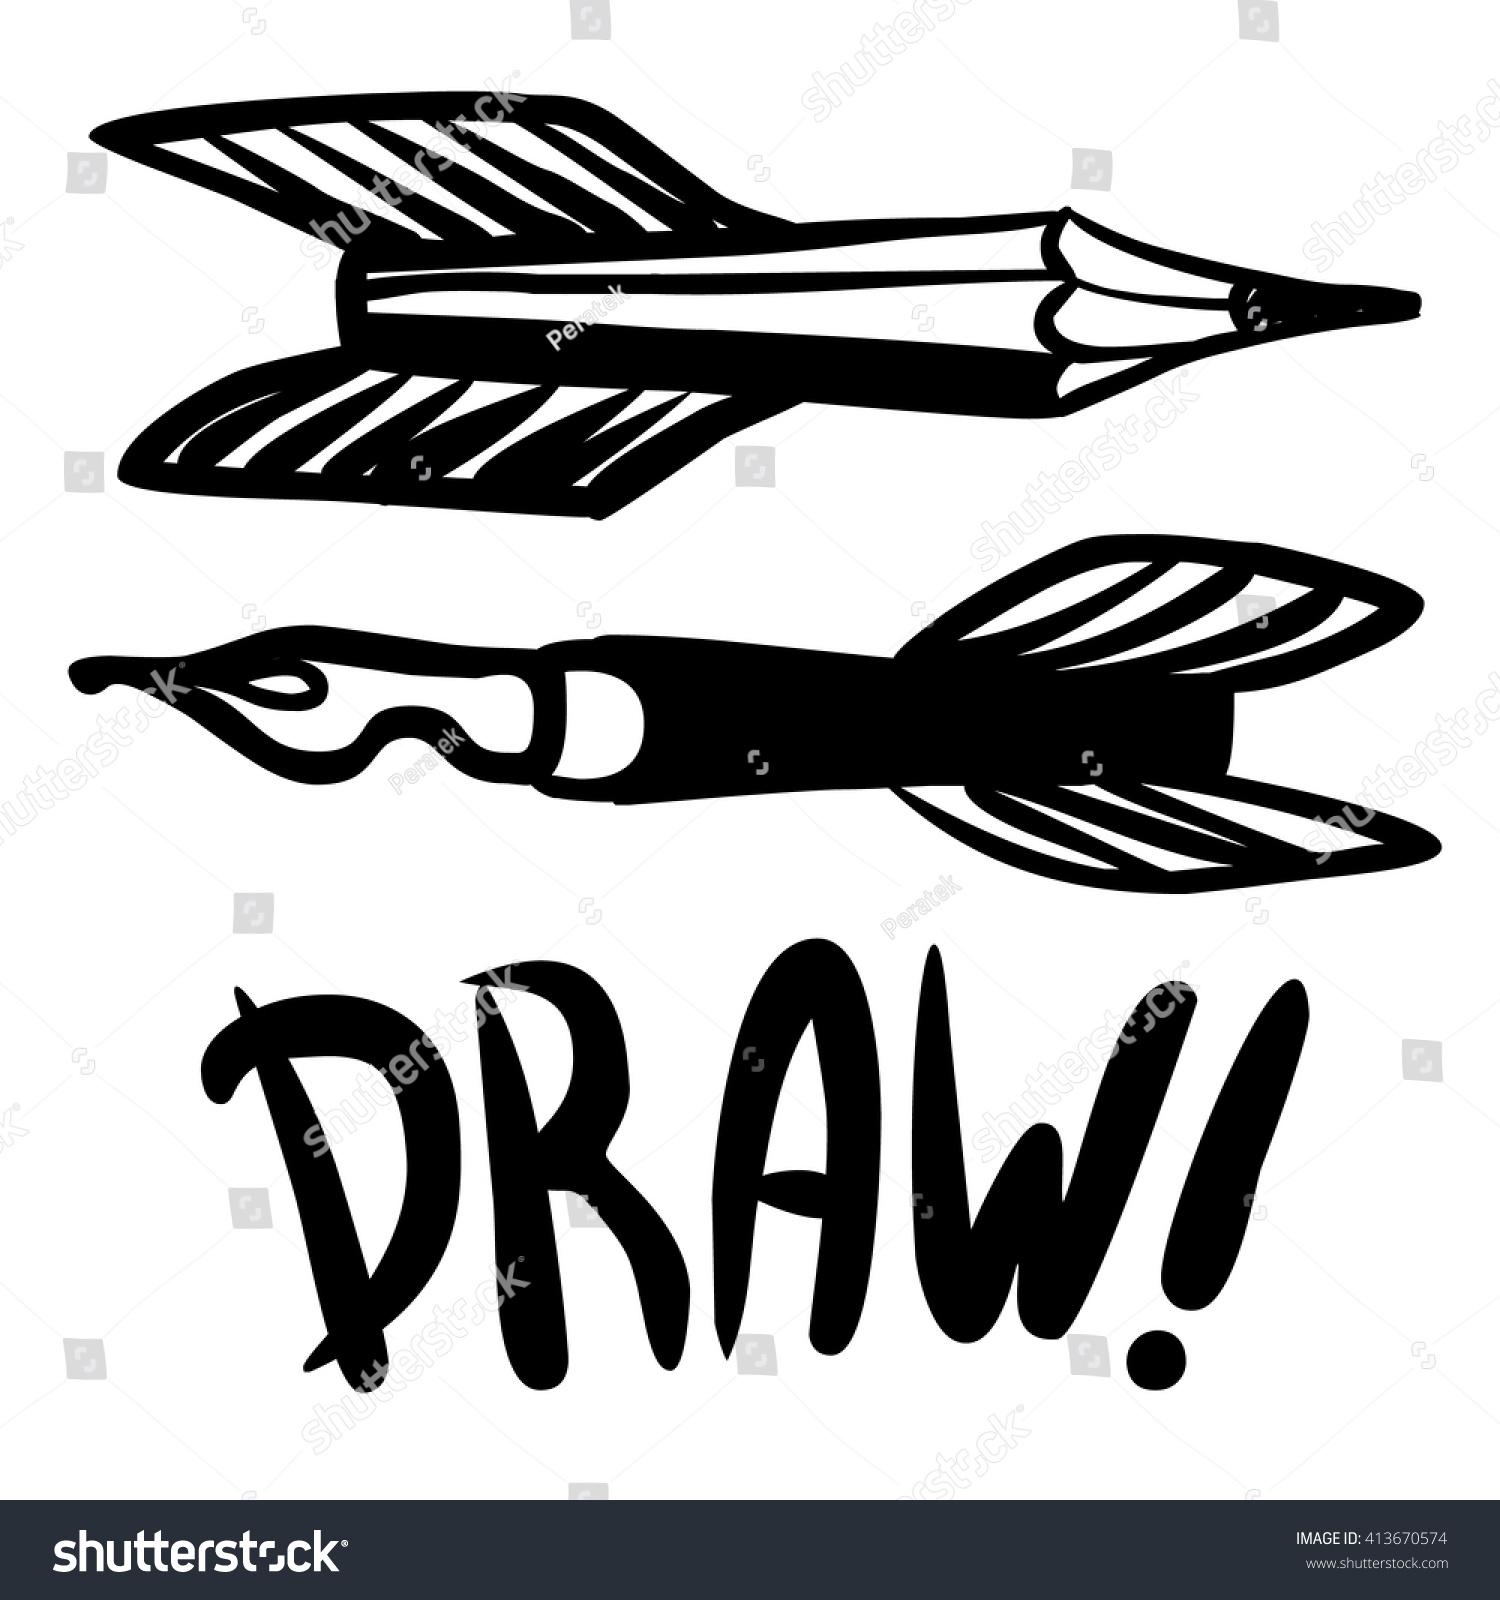 Flying Pens Pencils Symbols Creativity Vector Stock Vector Royalty